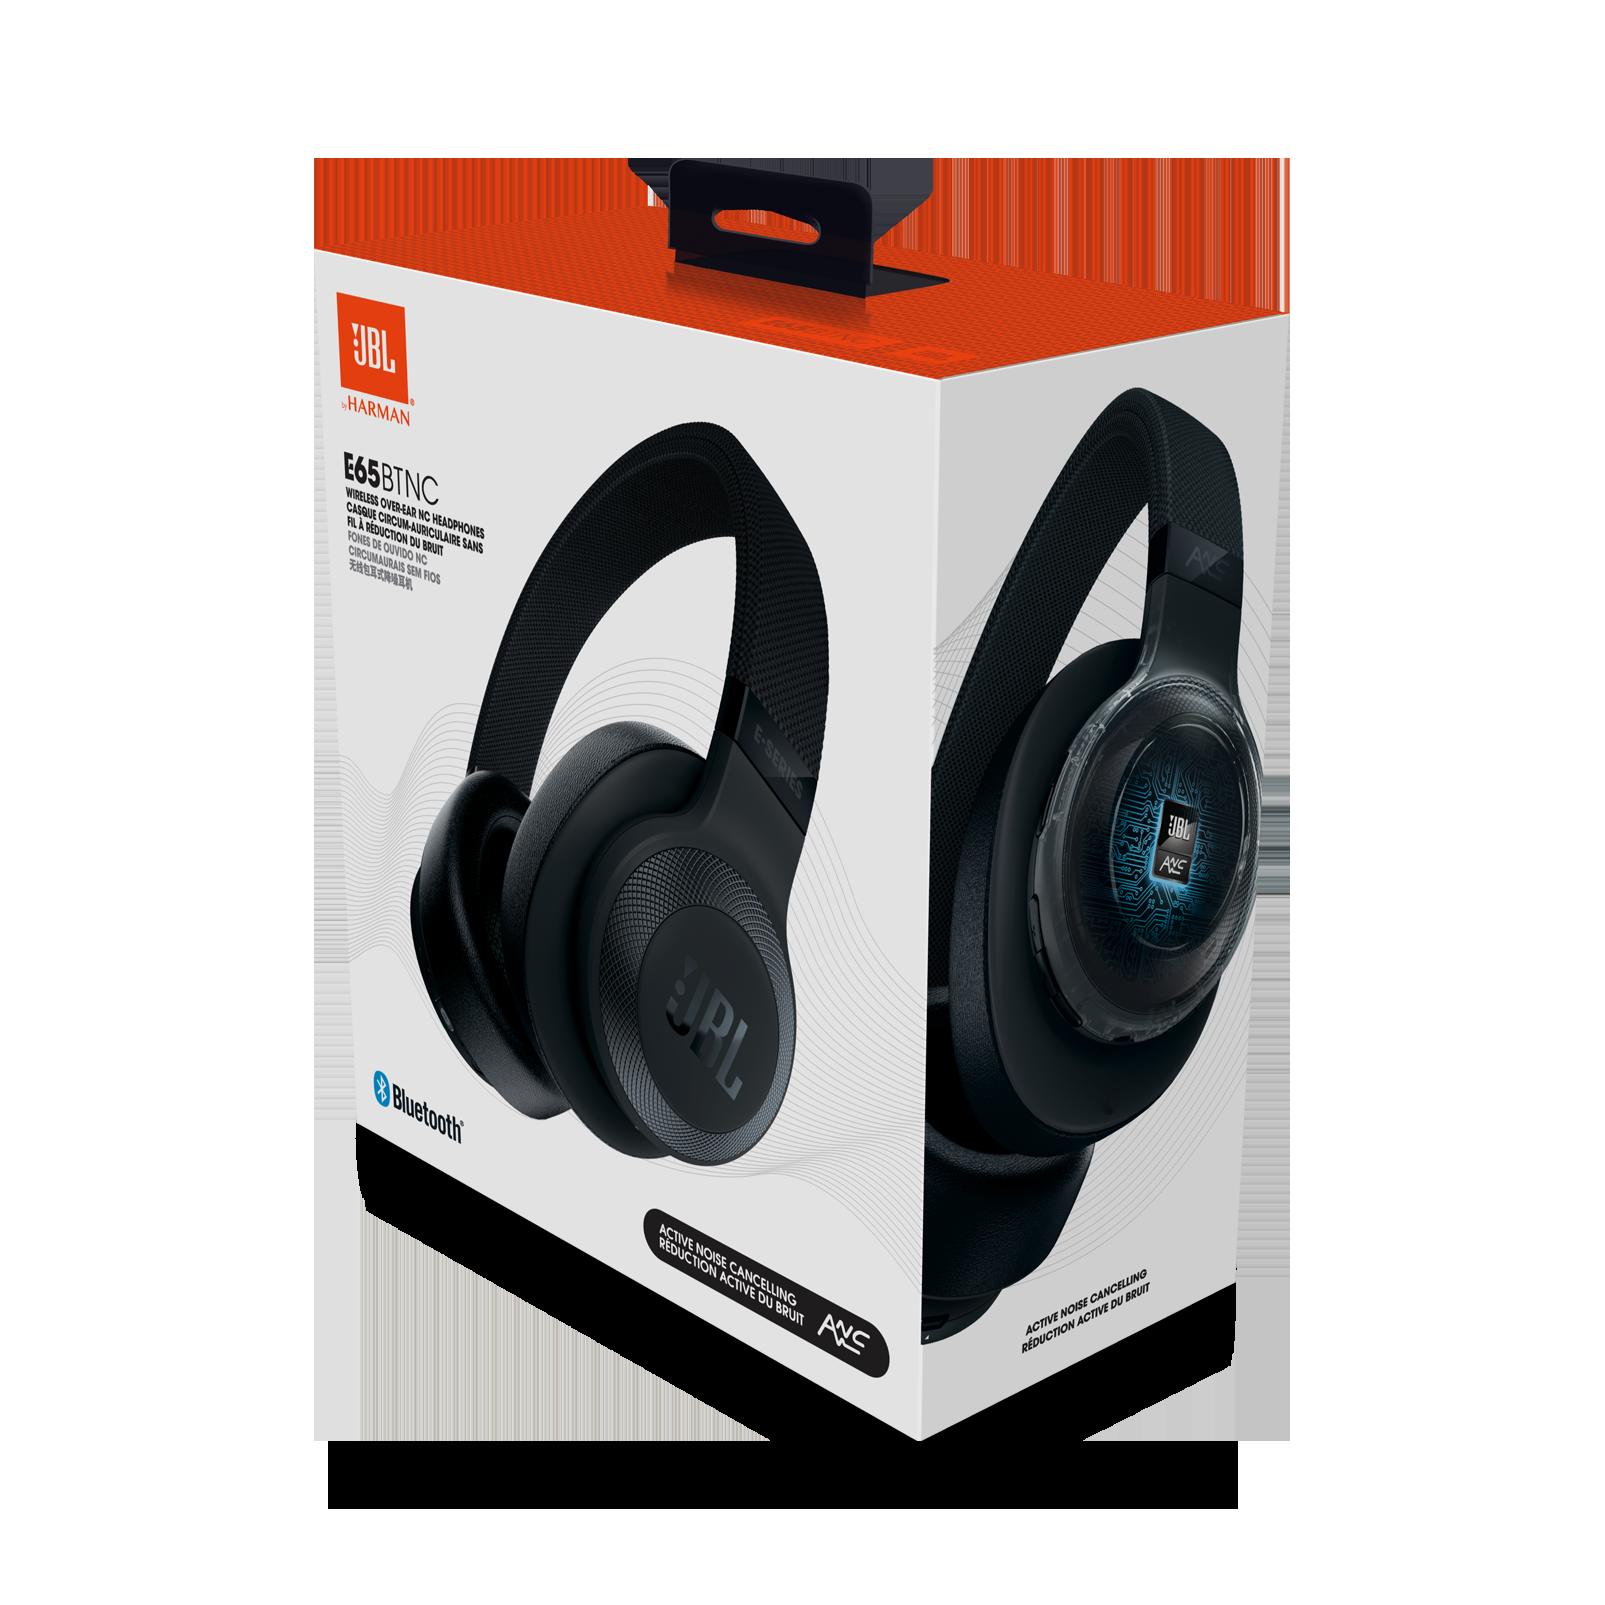 JBL E65BTNC | Wireless over ear noise cancelling headphones